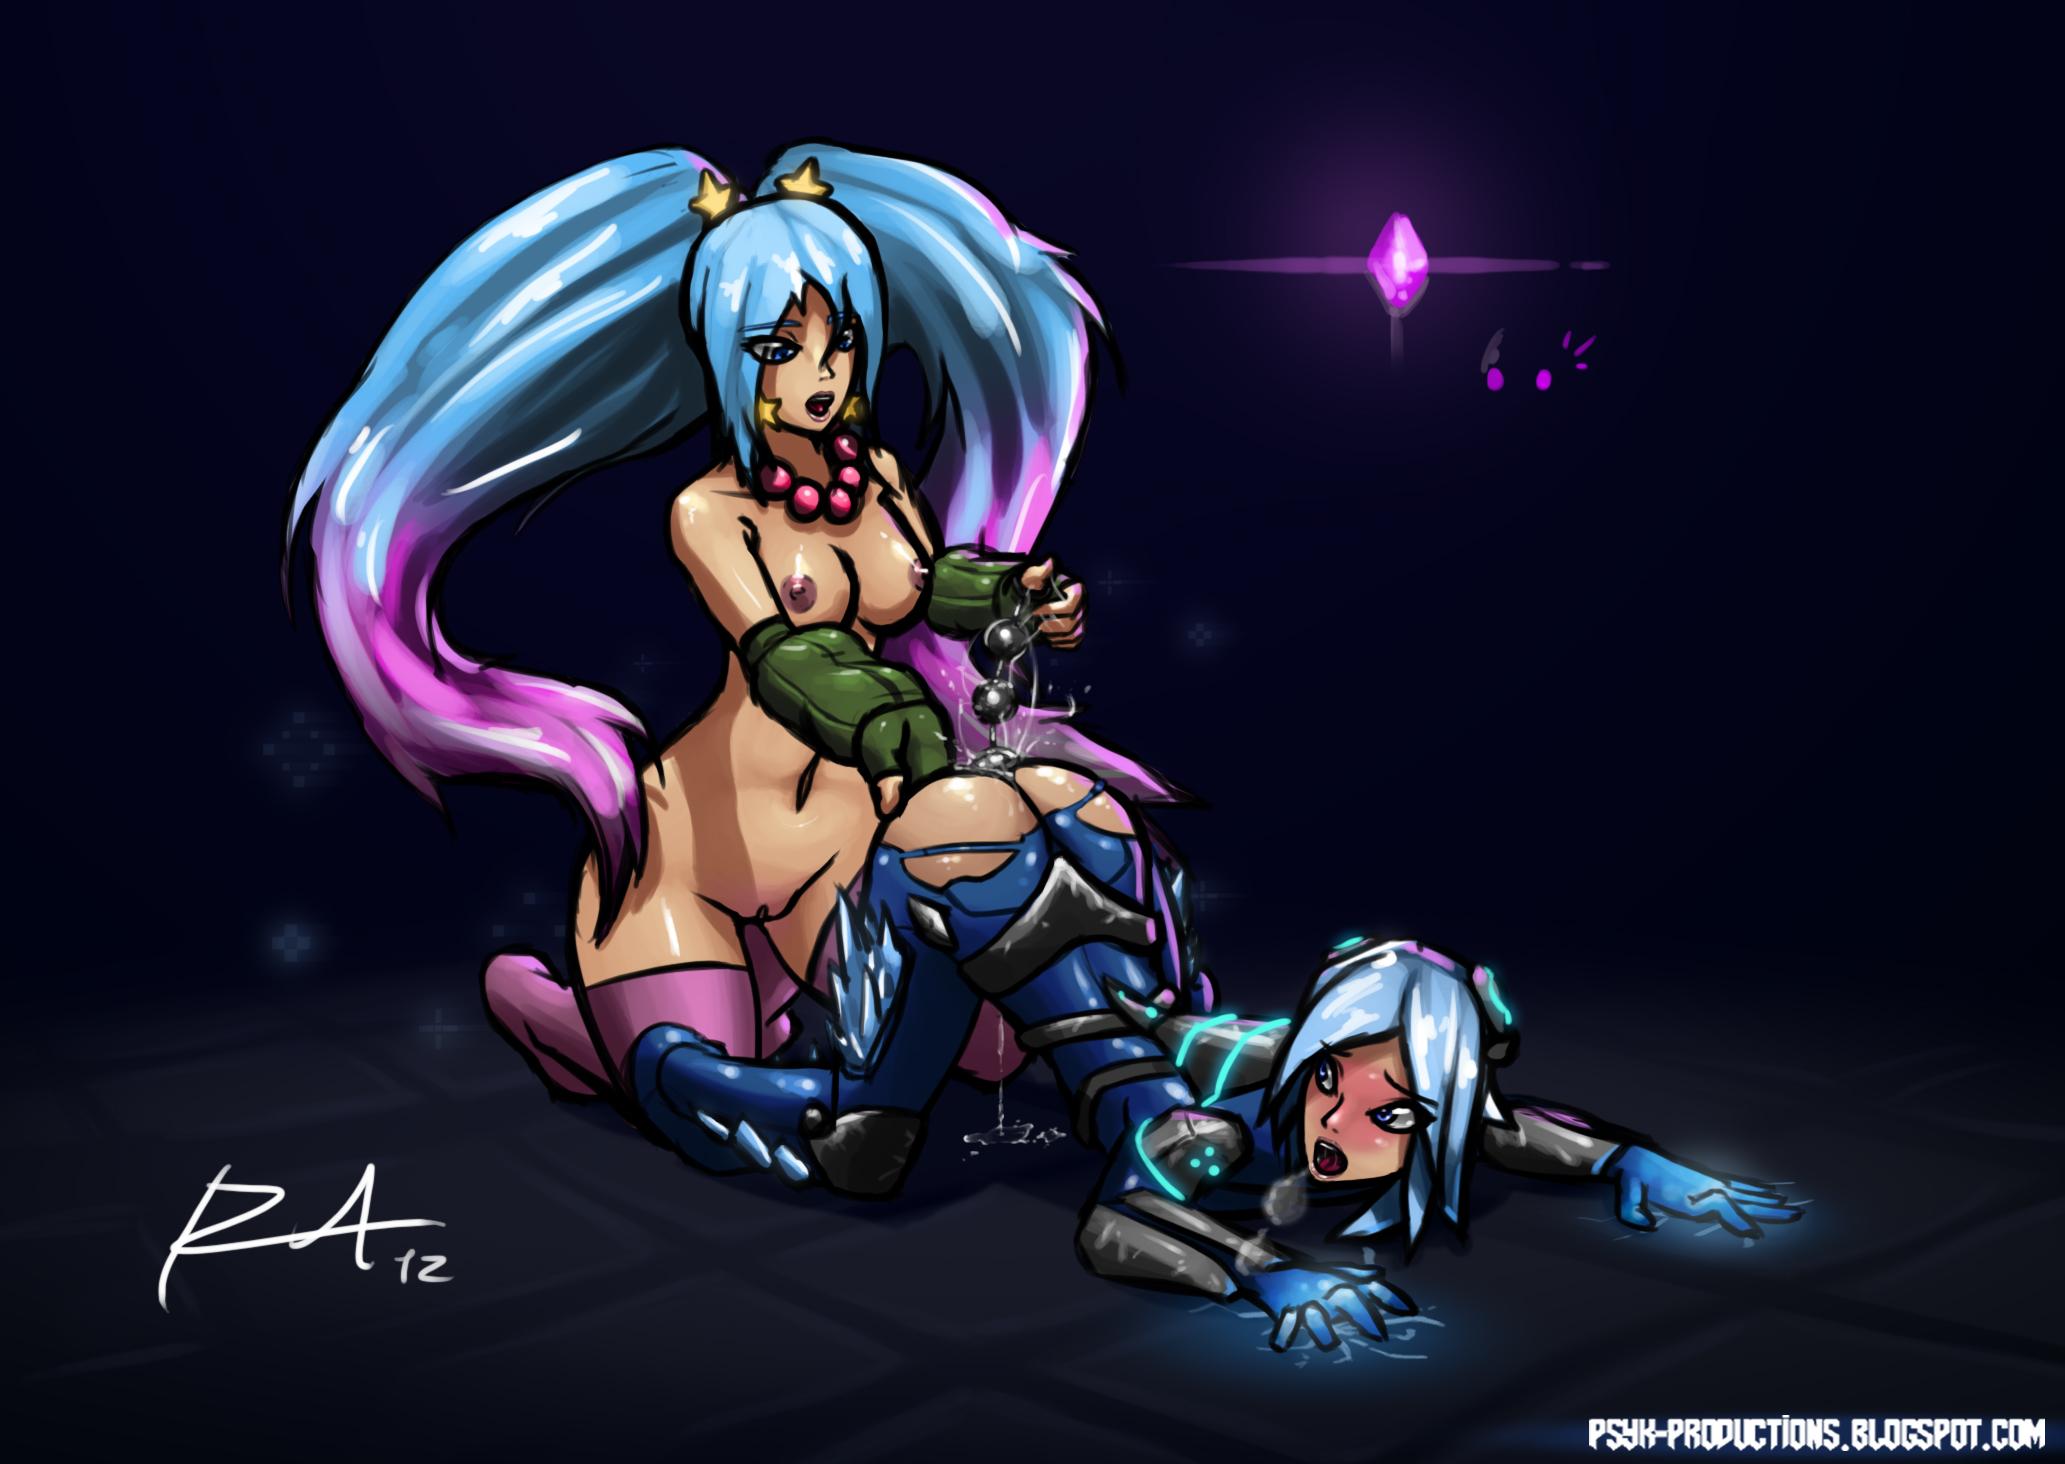 Arcade Sona and Irelia